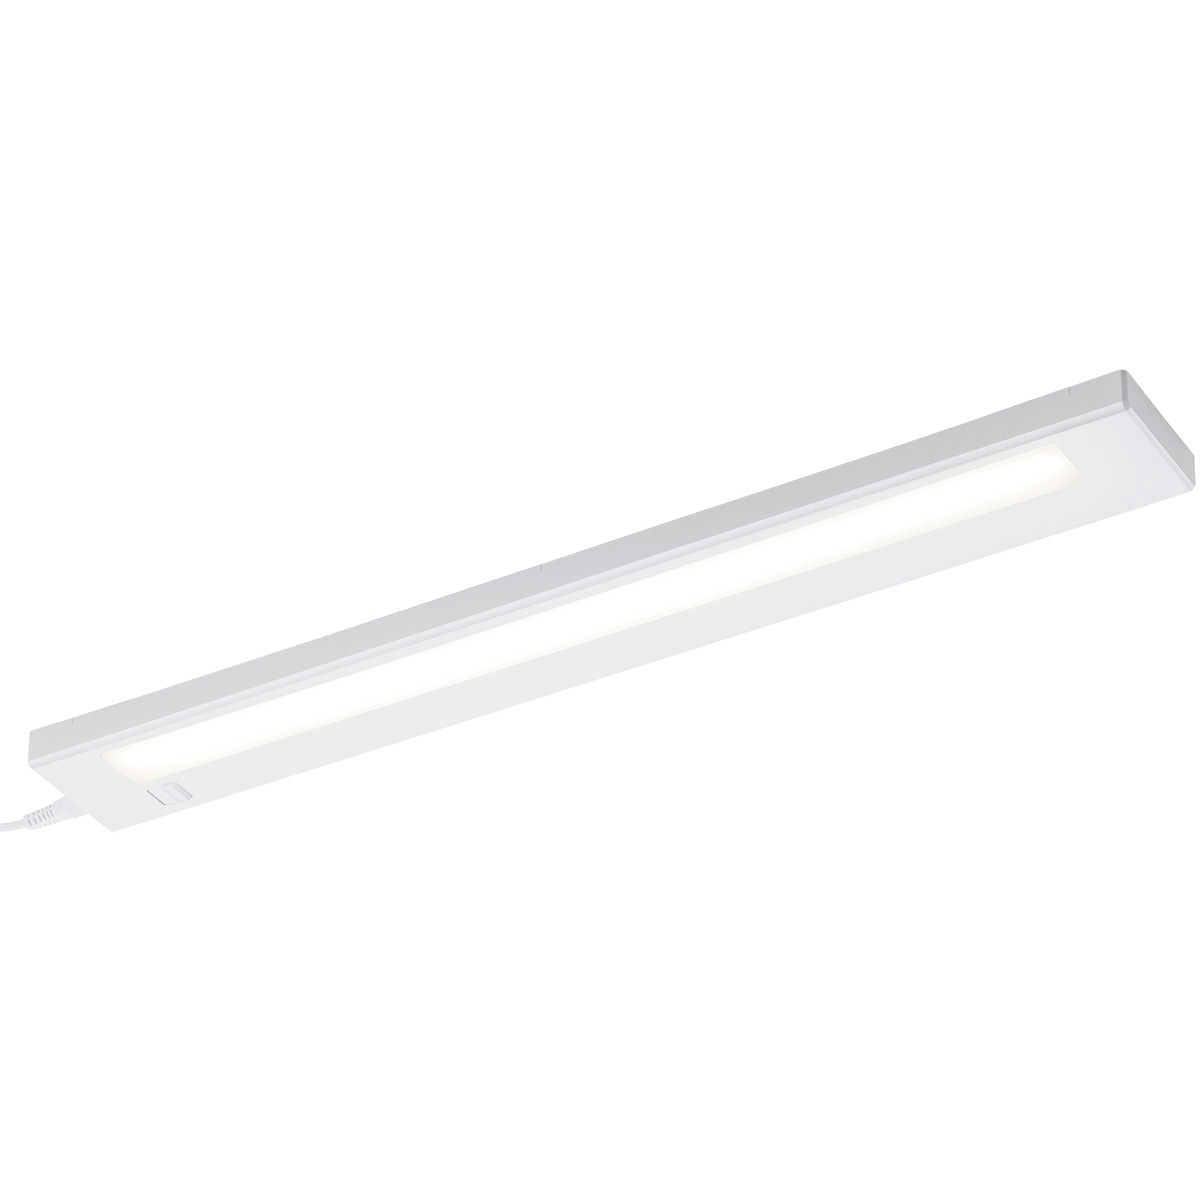 LED Wandlamp Trion Alyna 7W Warm Wit 3000K Rechthoek Mat Wit